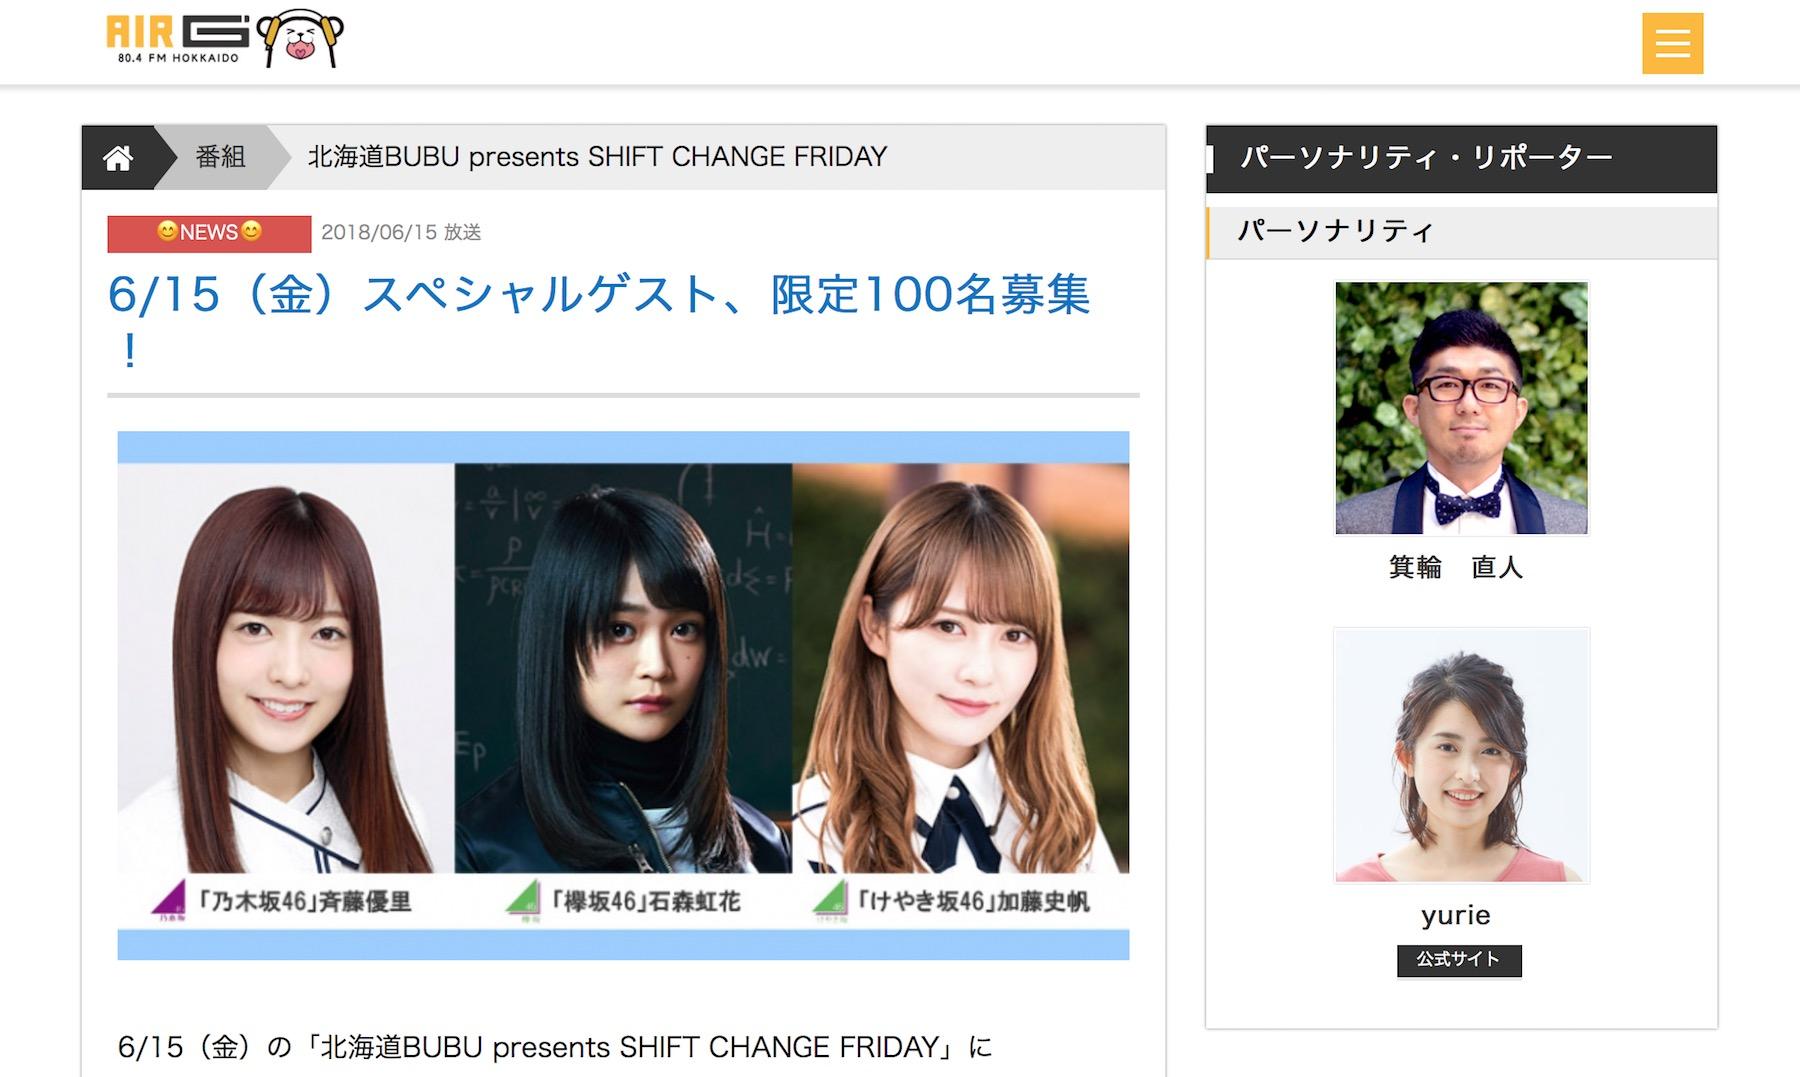 AIR-G'「北海道BUBU presents SHIFT CHANGE FRIDAY」